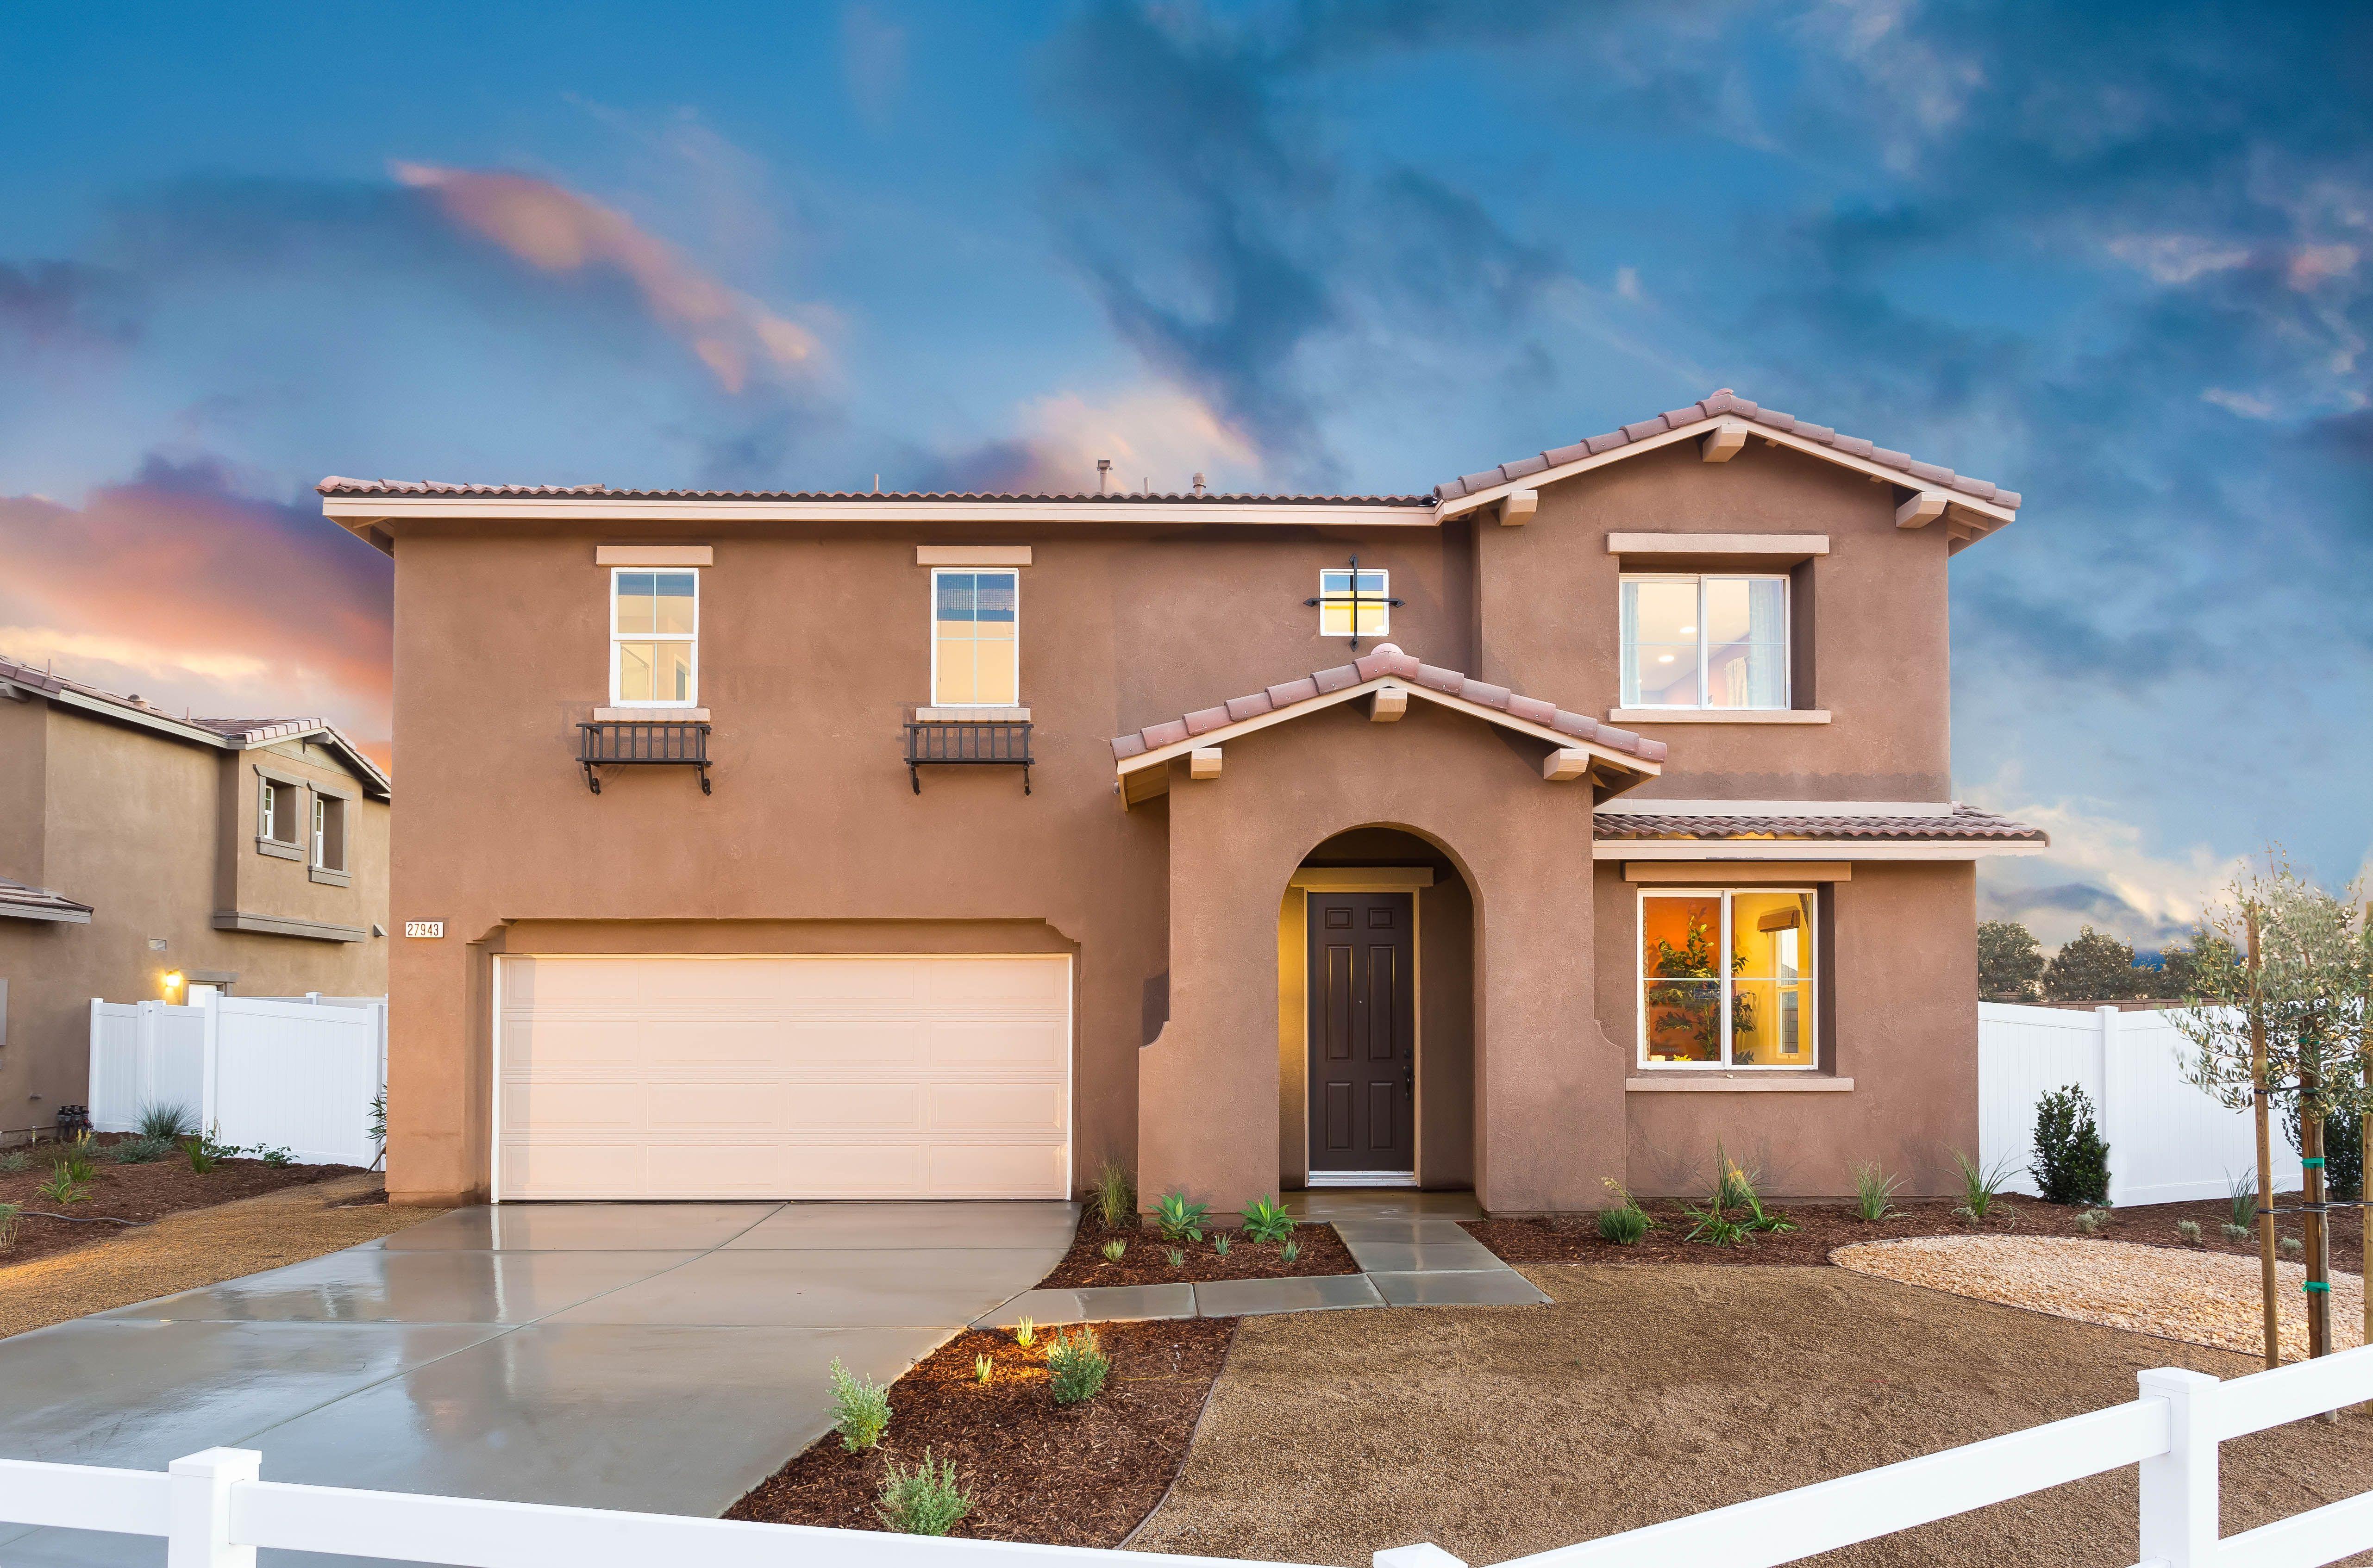 New Homes in Riverside San Bernardino CA